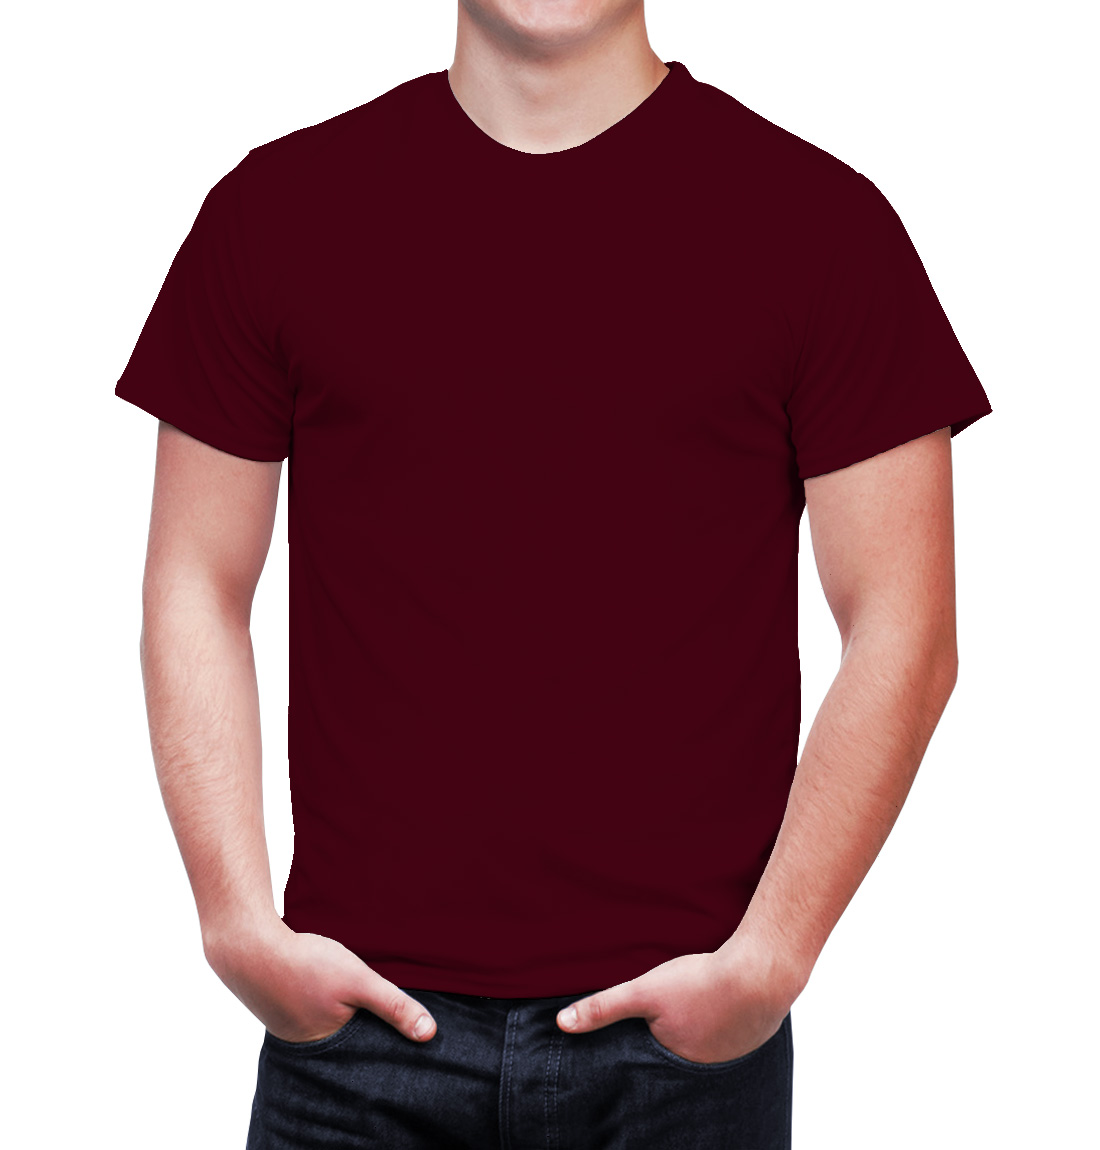 Enharid crew neck t shirt maroon enharid for Maroon t shirt for men